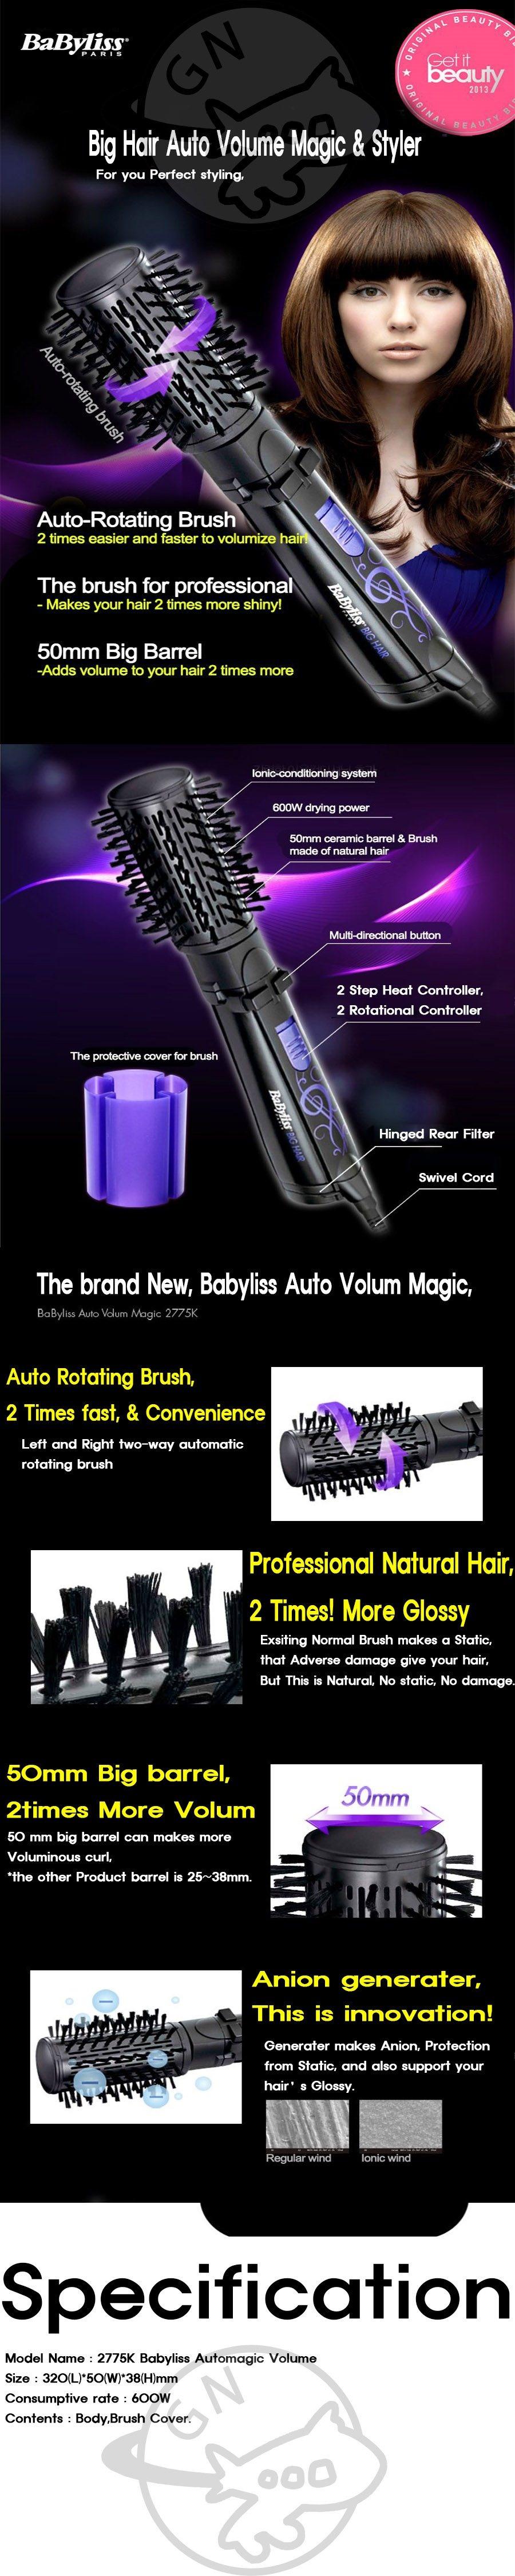 Babyliss Big Hair Volume Magic Amp Styler 2775k Black